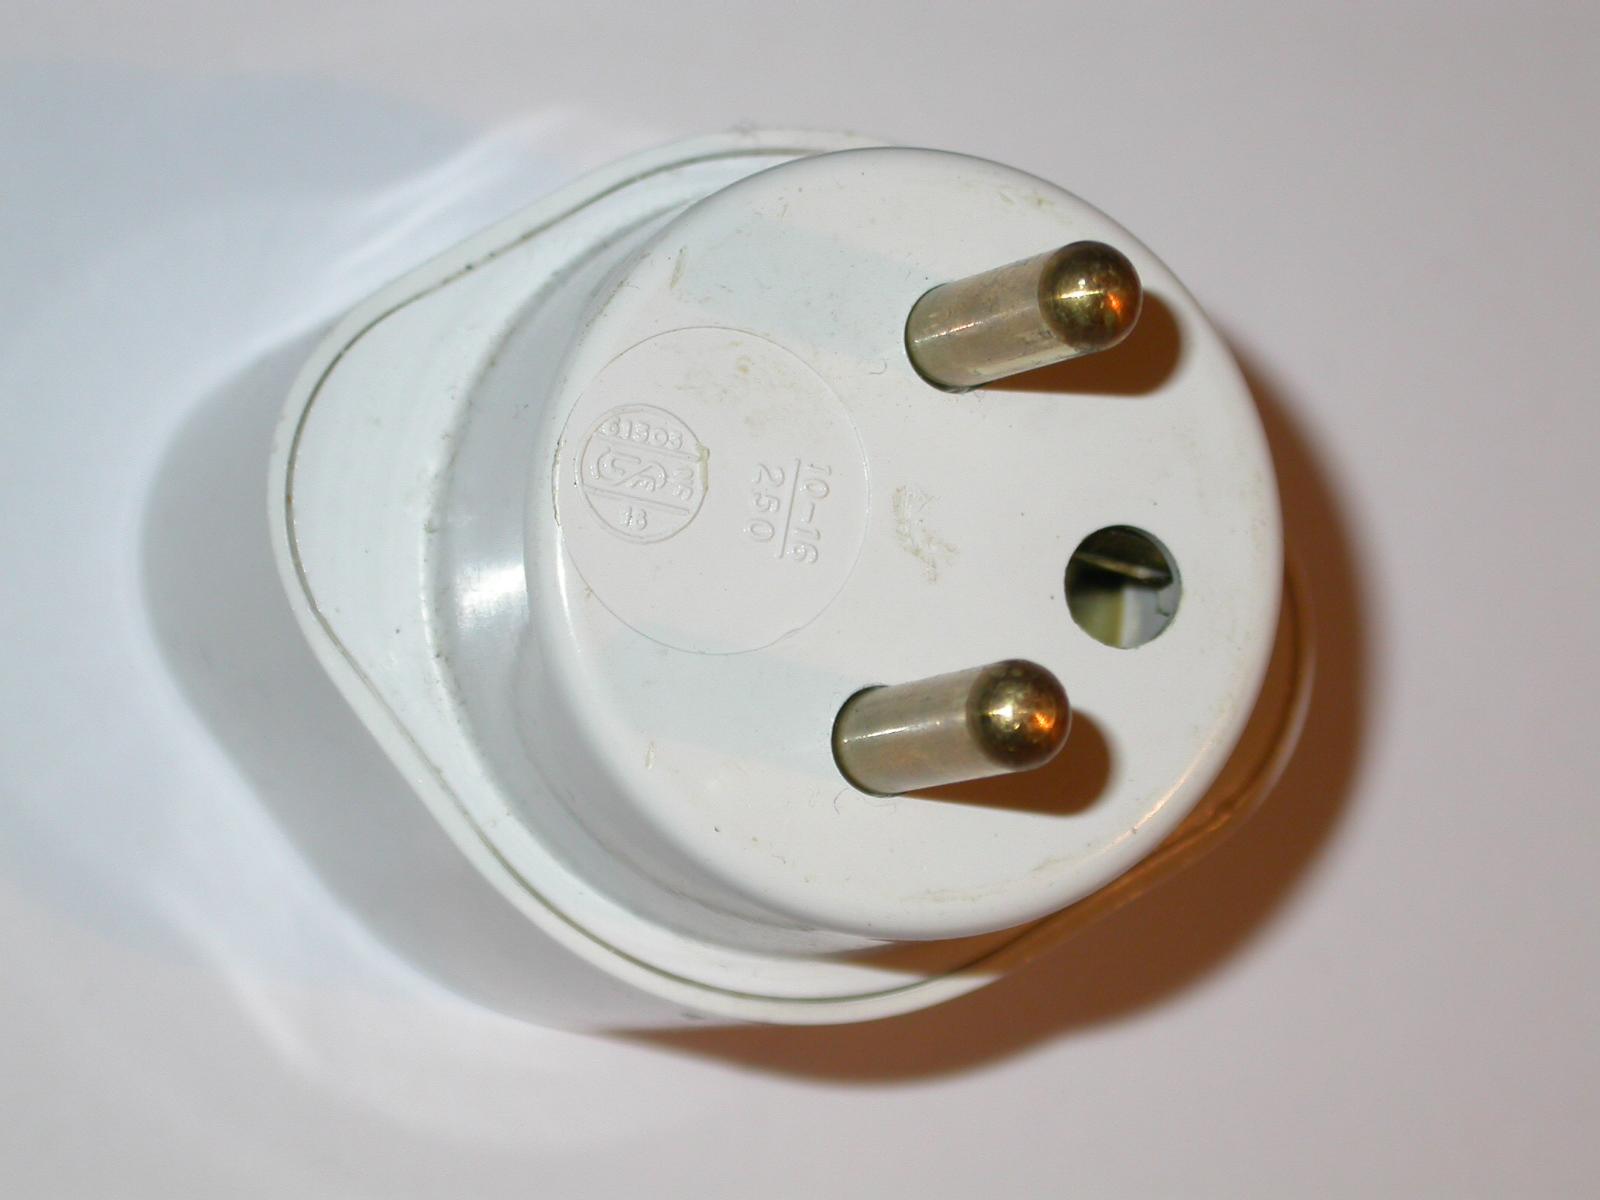 Plug Type c f Older Flat-blade Type h Plug